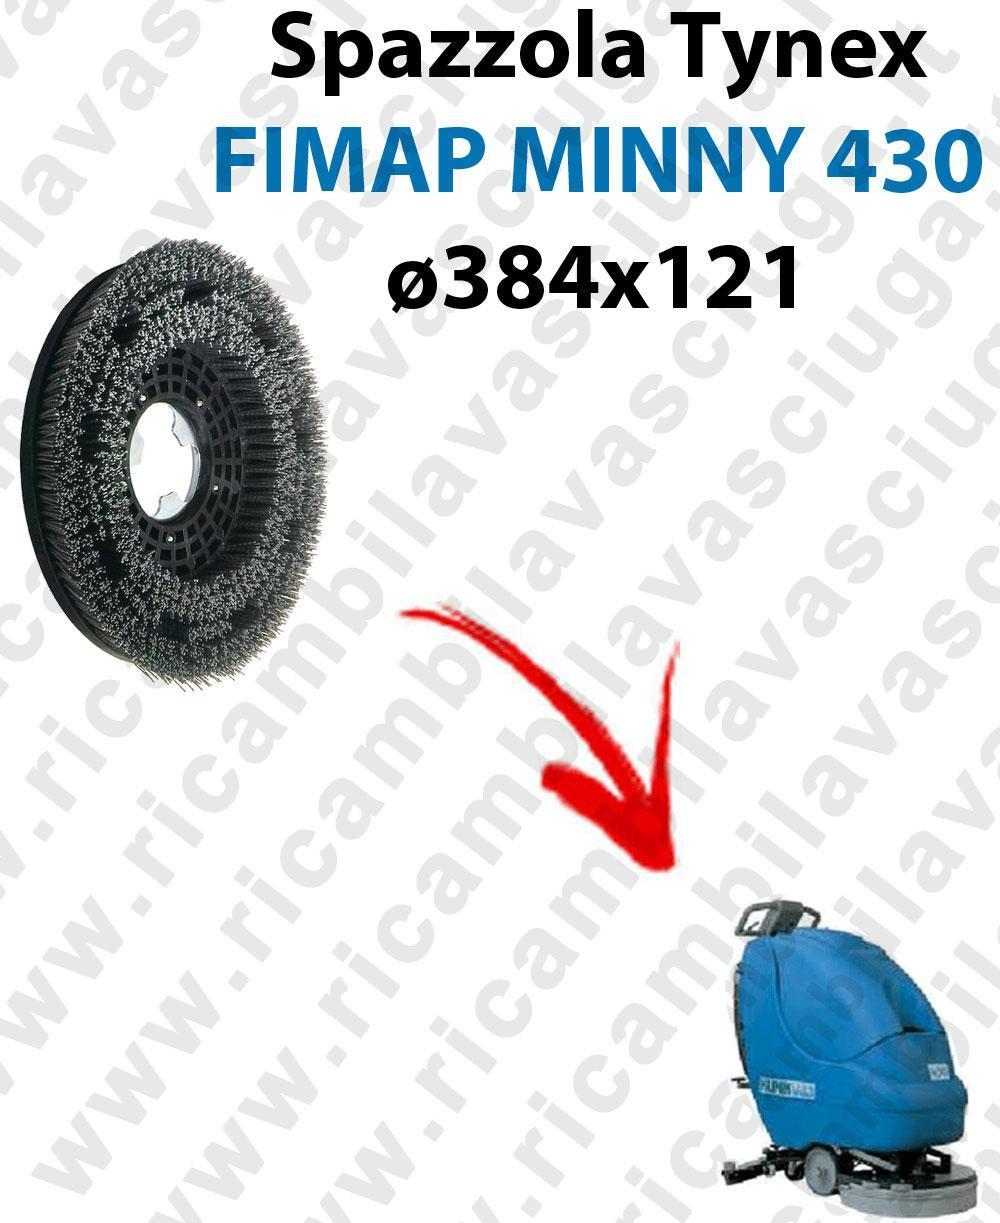 BROSSE TYNEX  pour autolaveuses FIMAP MINNY 430. Reference: tynex  diamétre 384 X 121